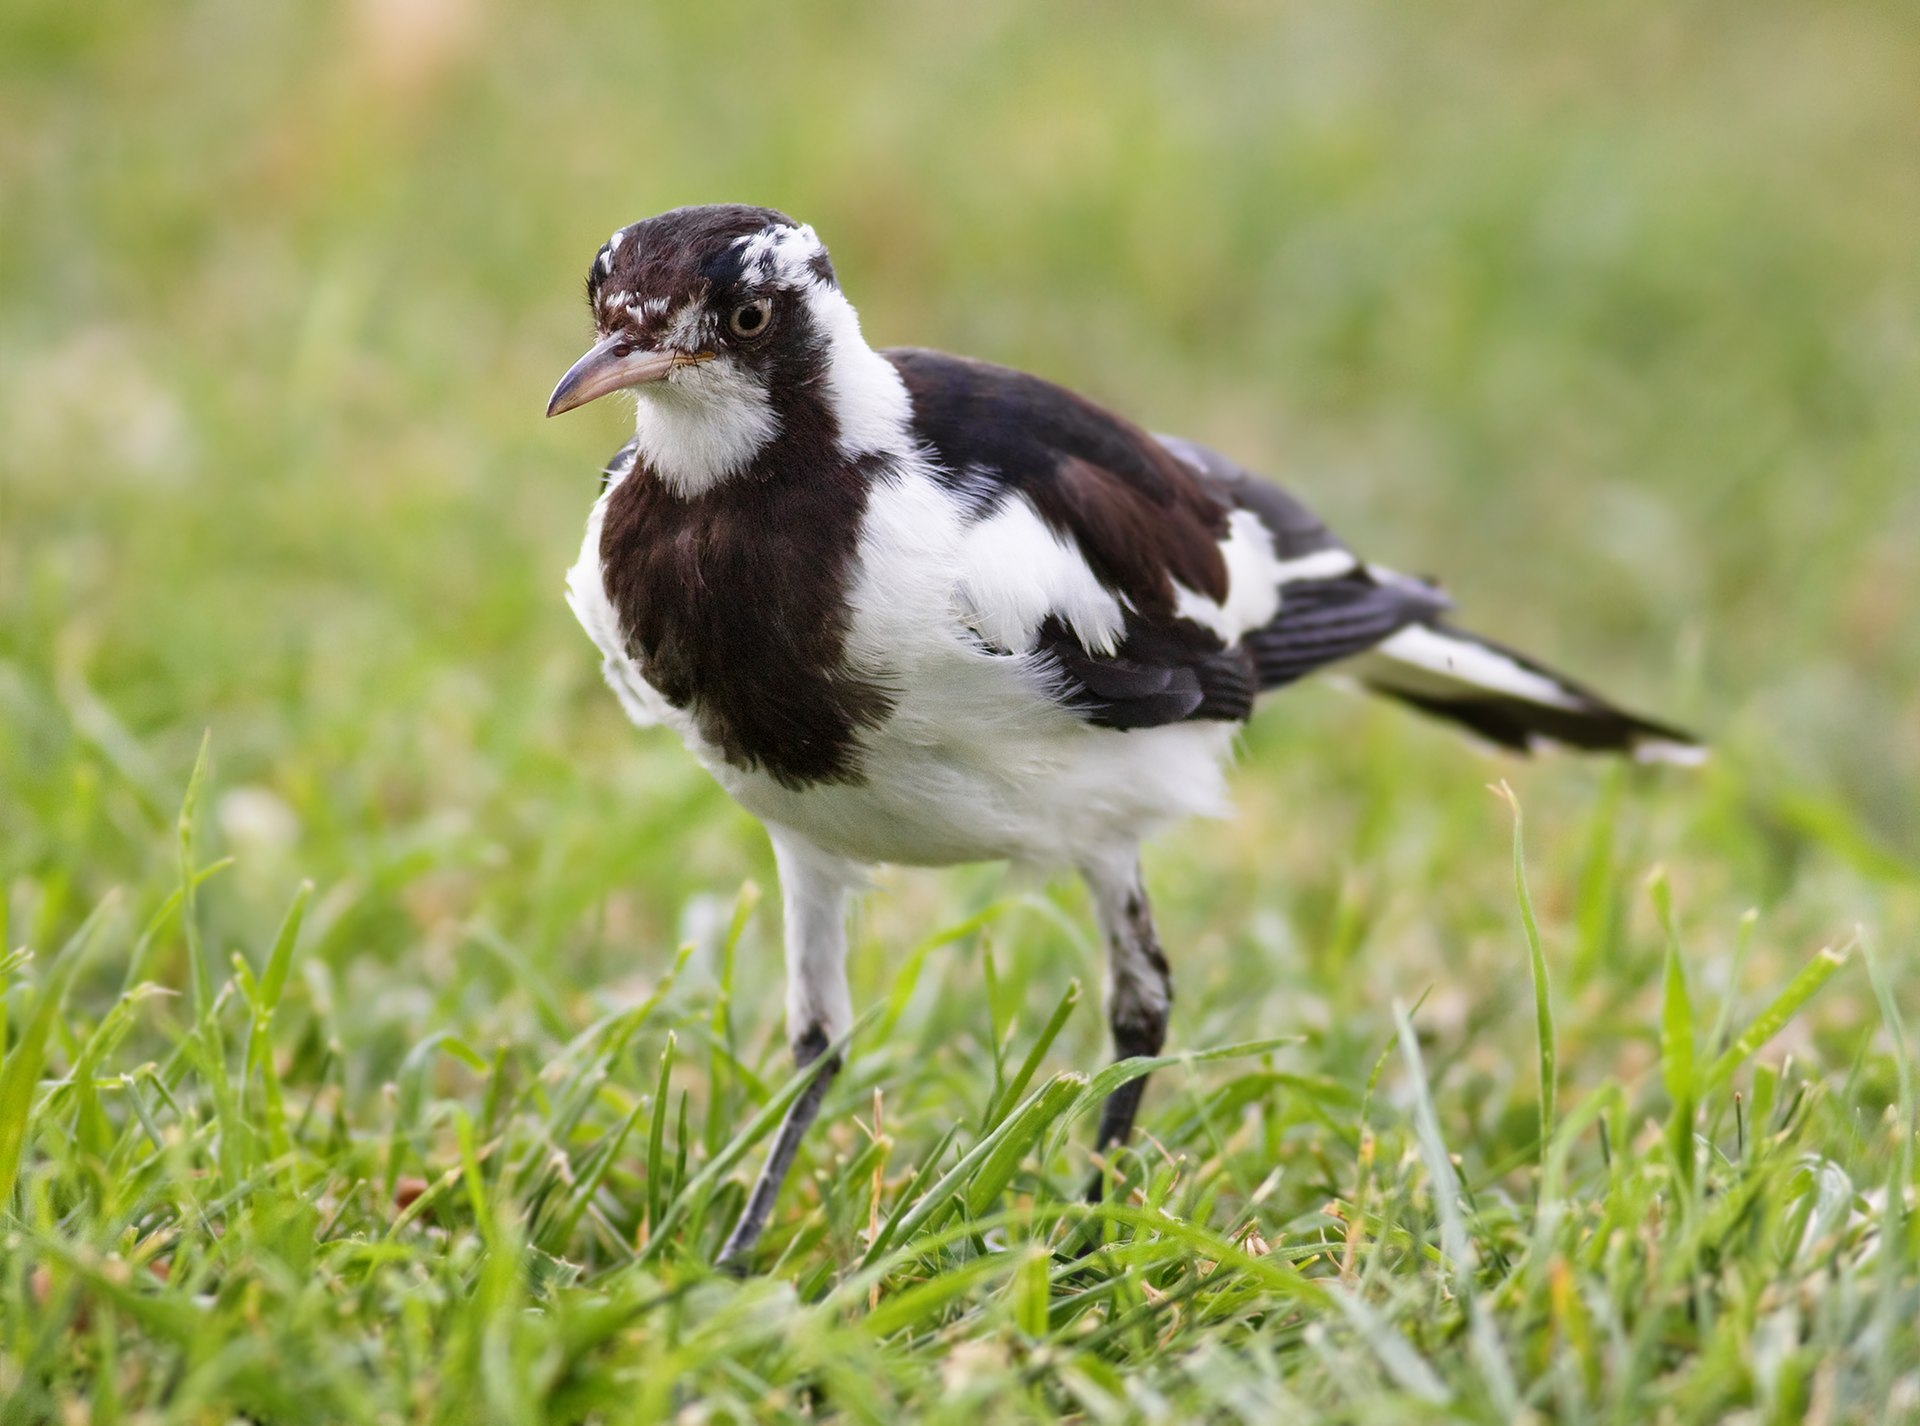 magpie australian lark cyanoleuca female birds wikipedia bird edit